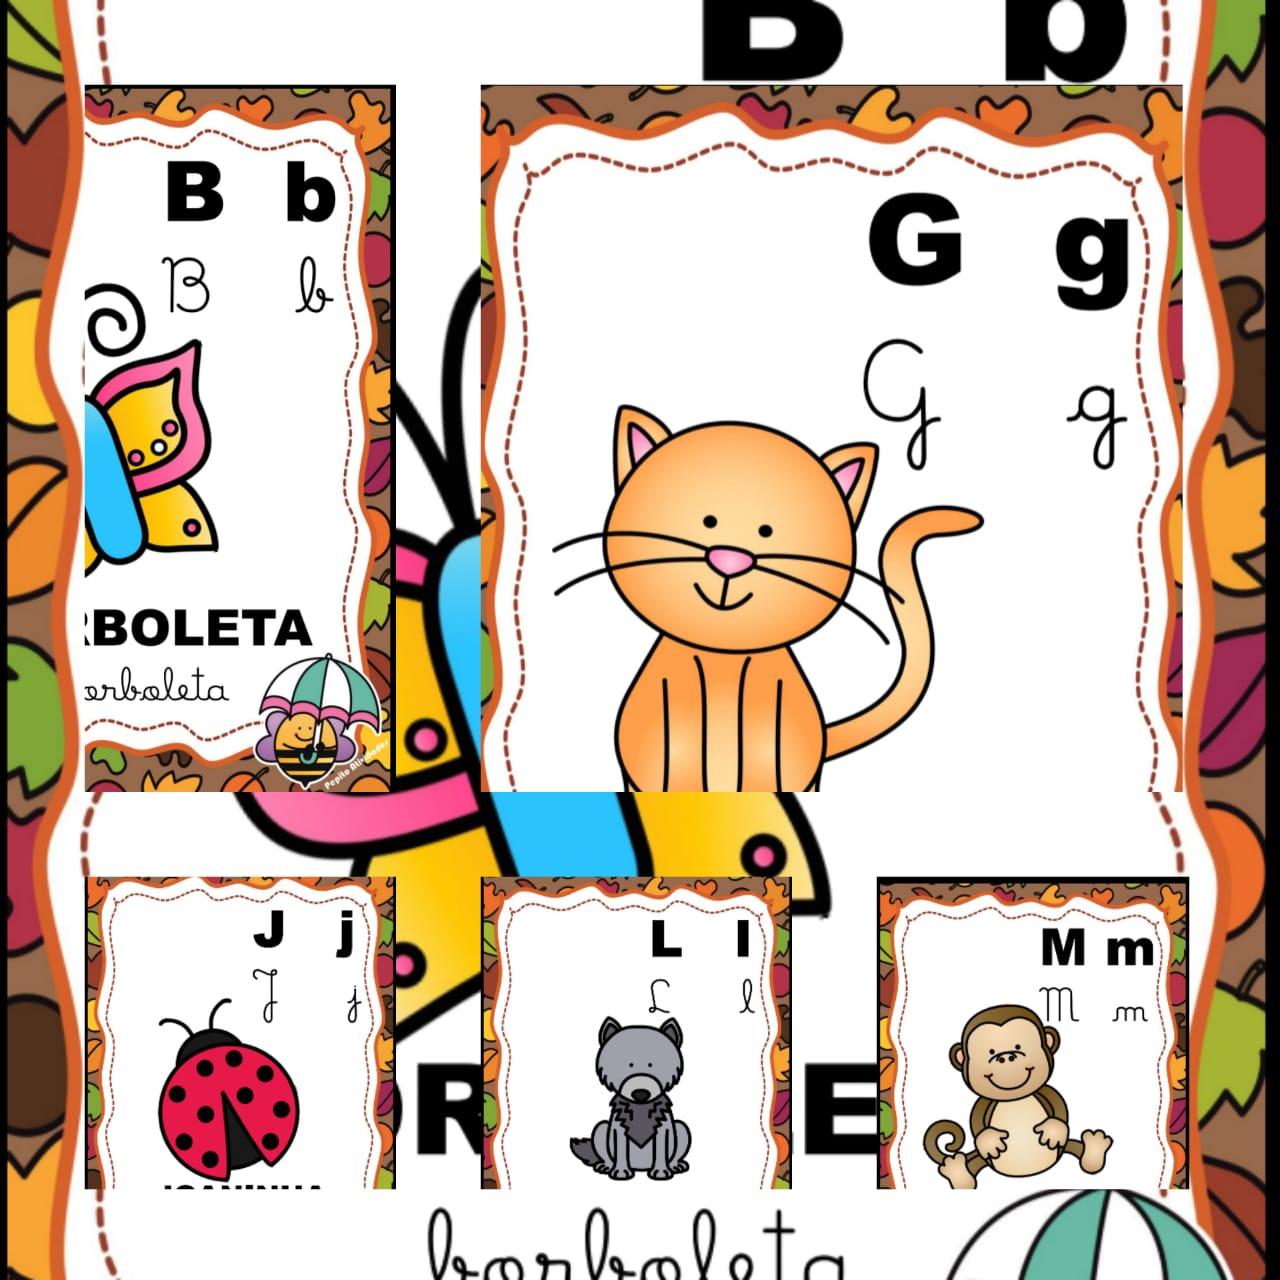 Alfabeto Ilustrado 4 Tipos De Letras No Tema Abelhinha